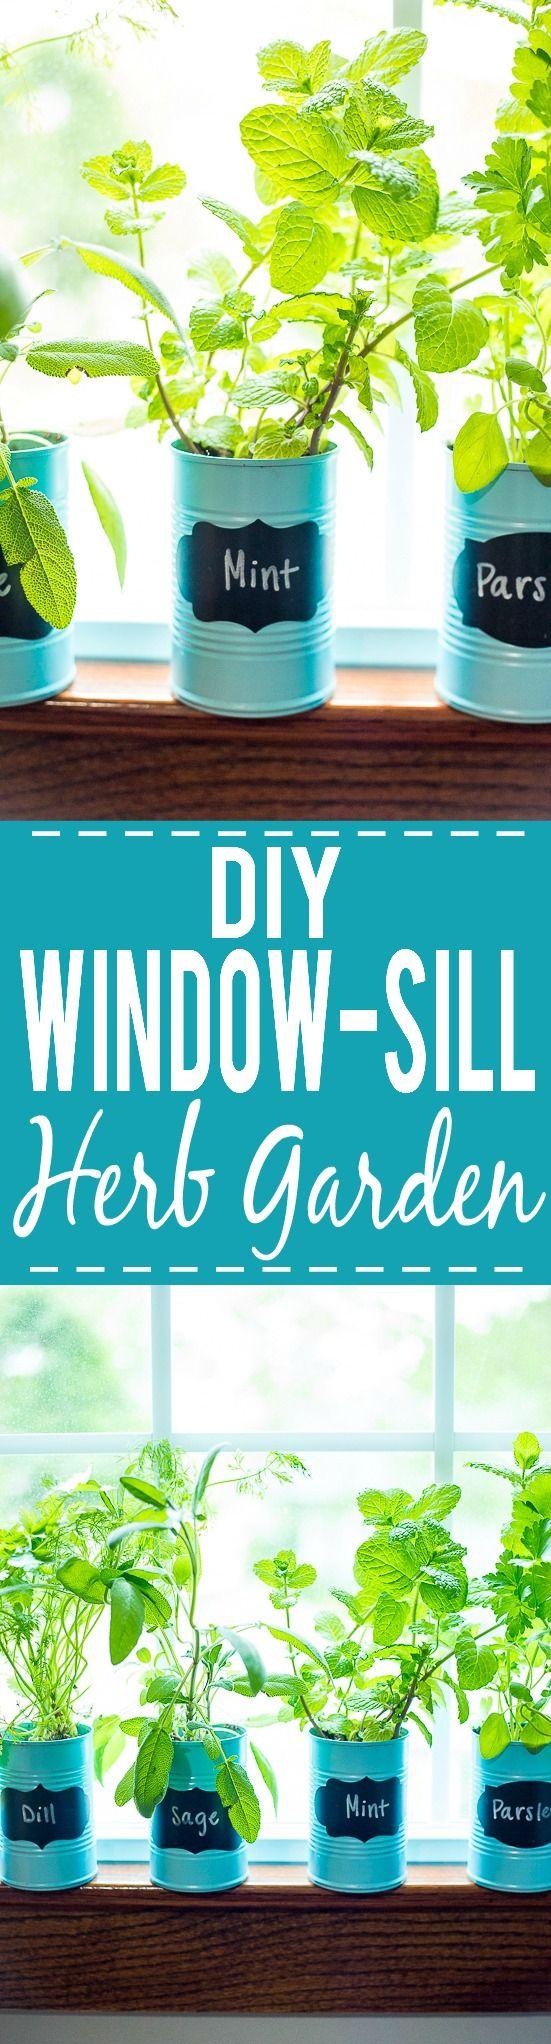 How to Make a DIY Indoor Window Sill Herb Garden - Save money ...